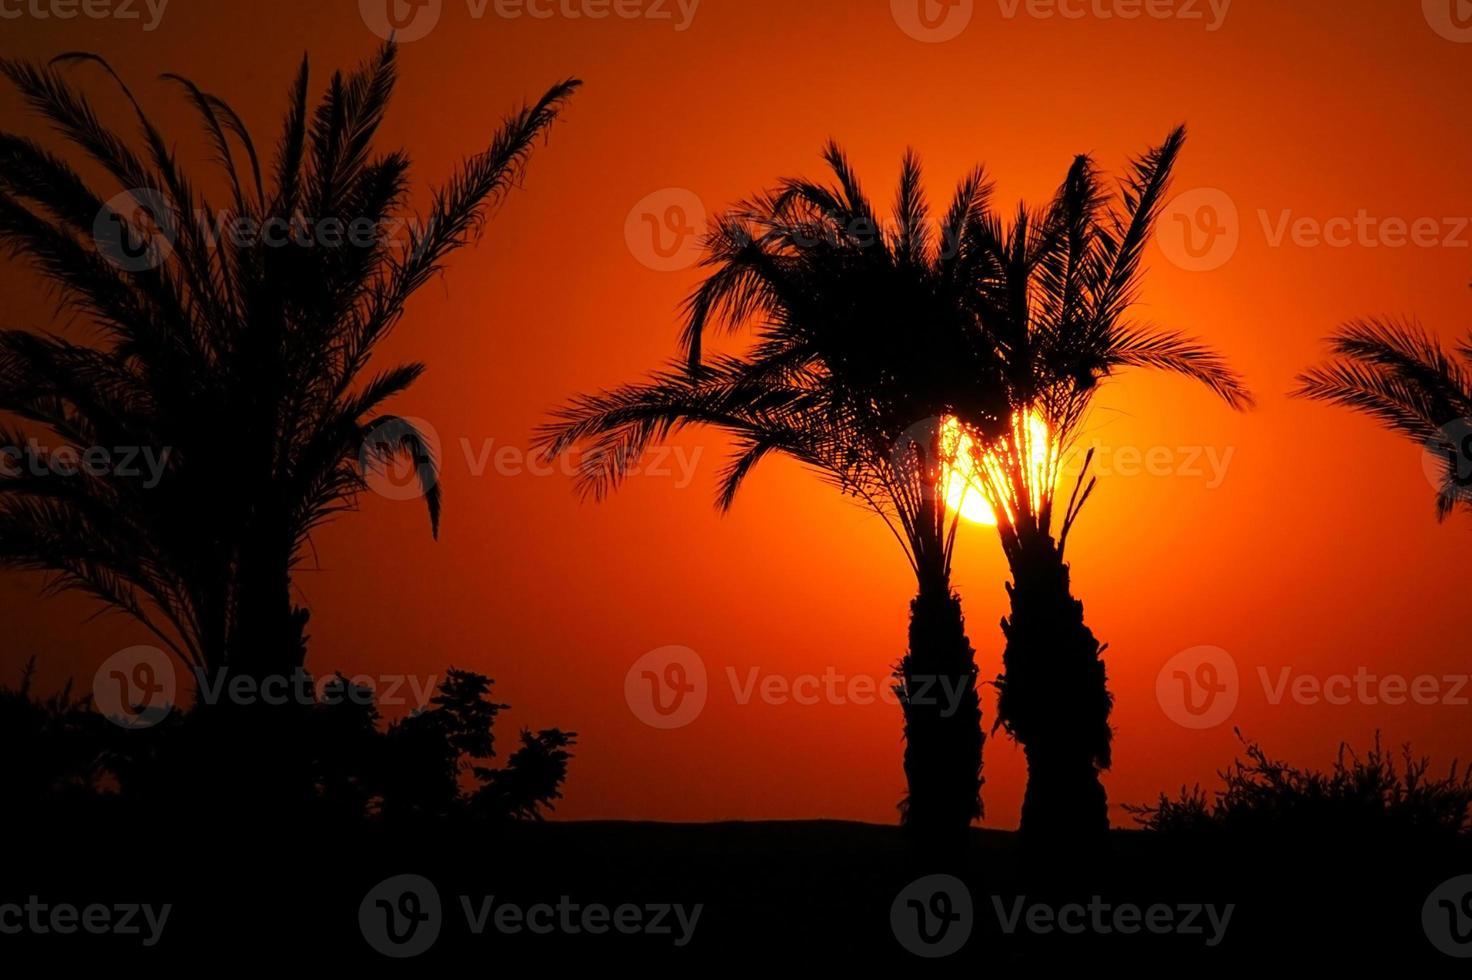 Sunset in Egypt photo